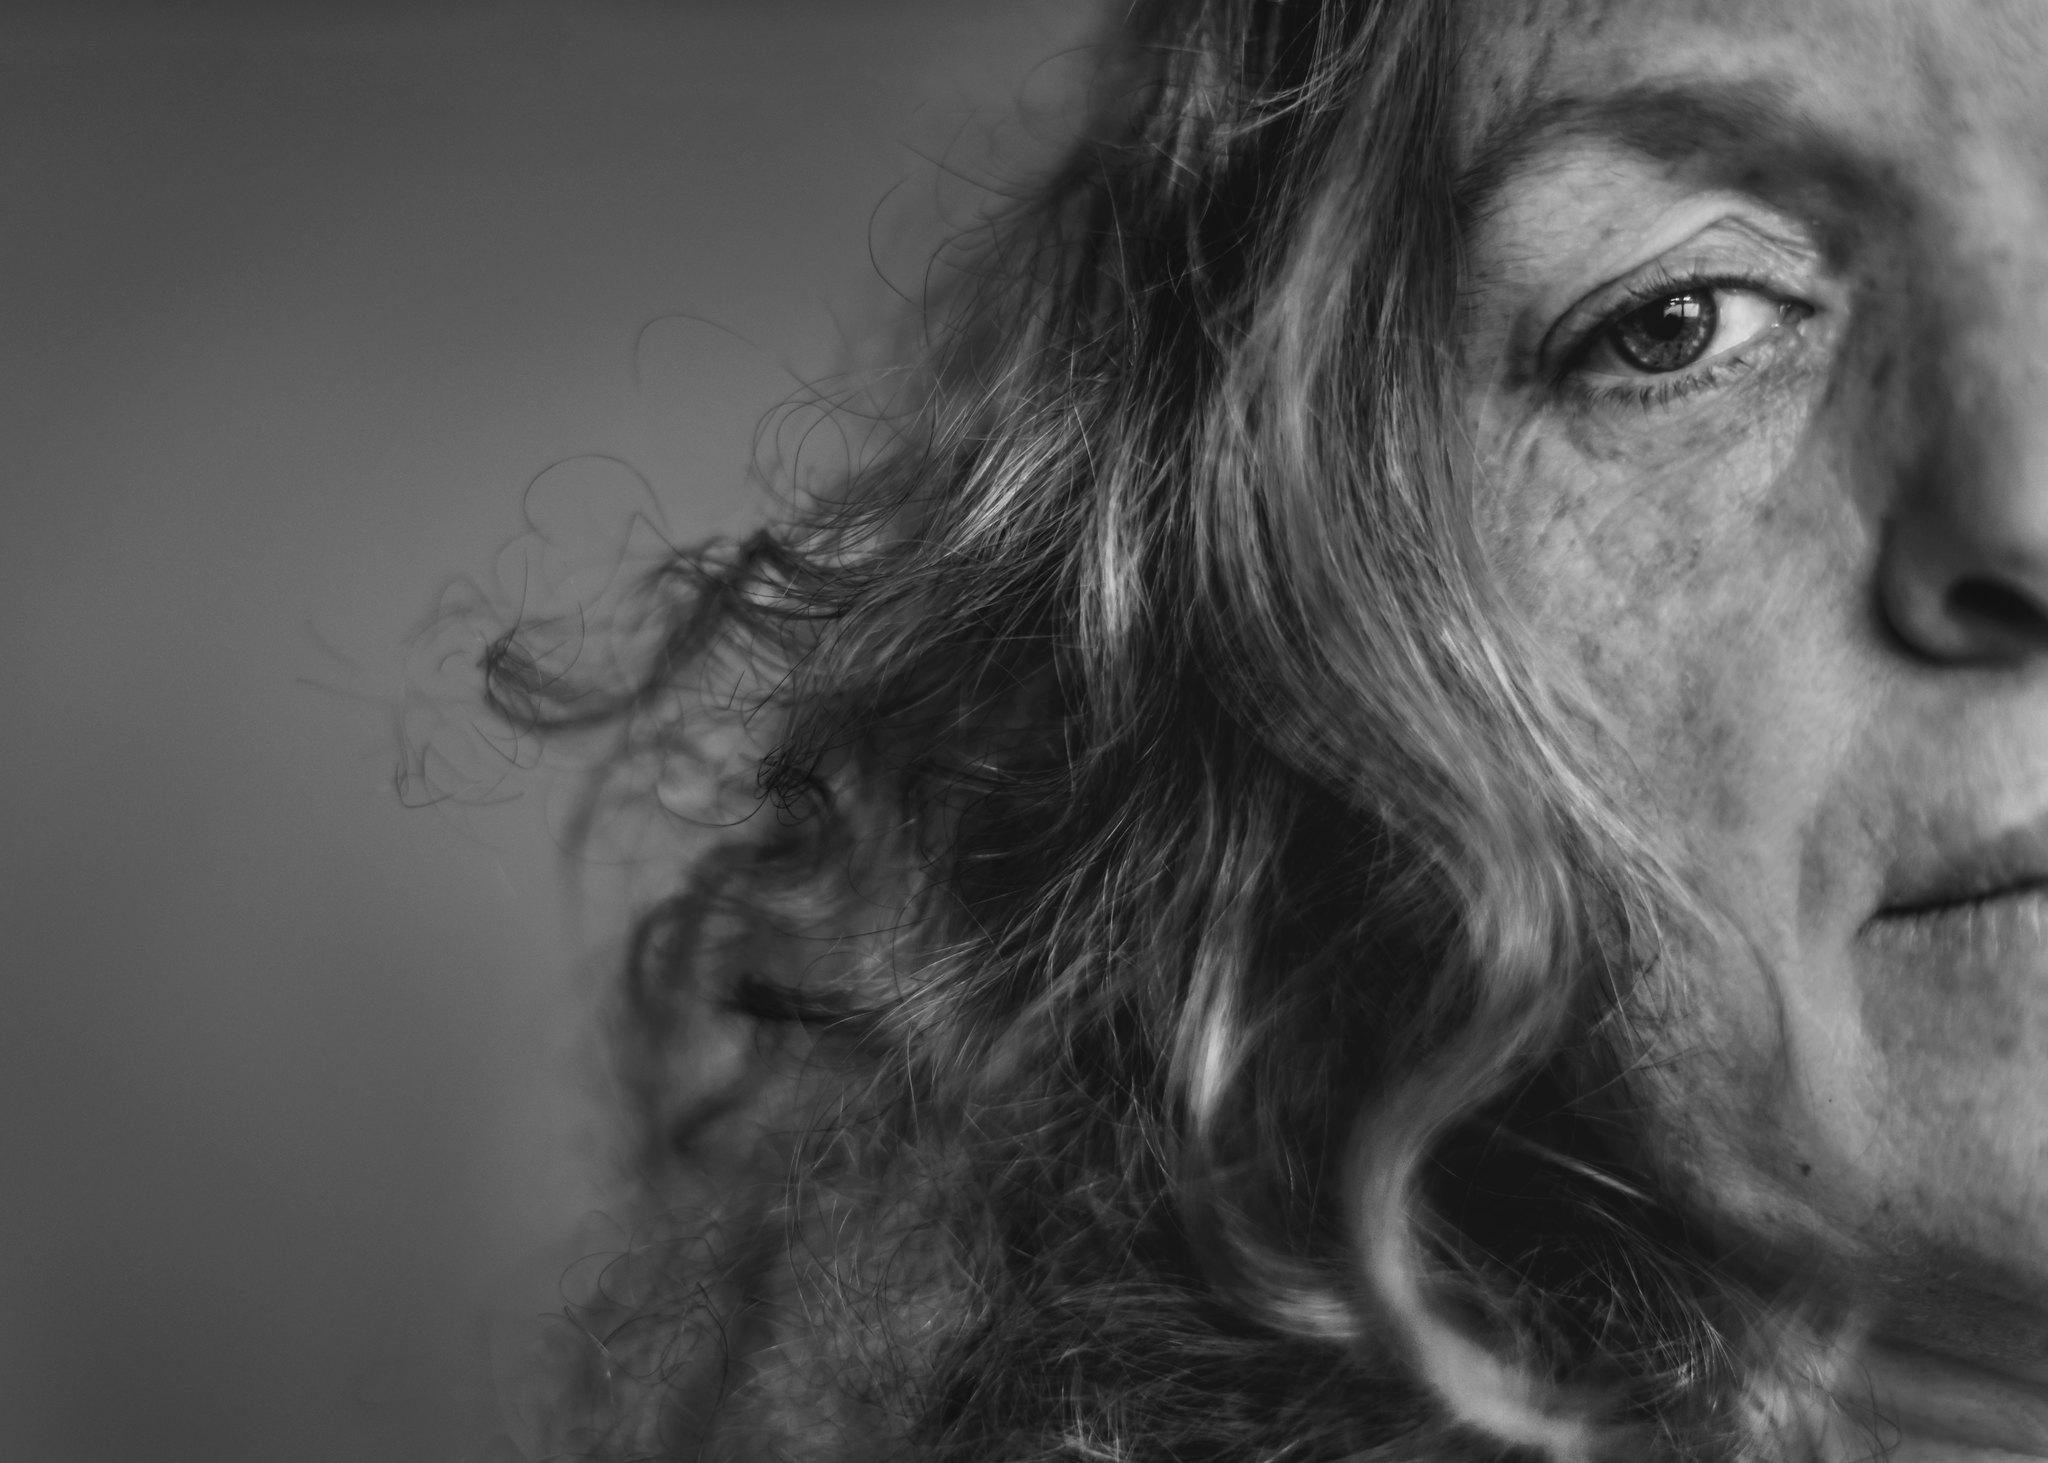 Self portrait of Photographer Katy Bindels